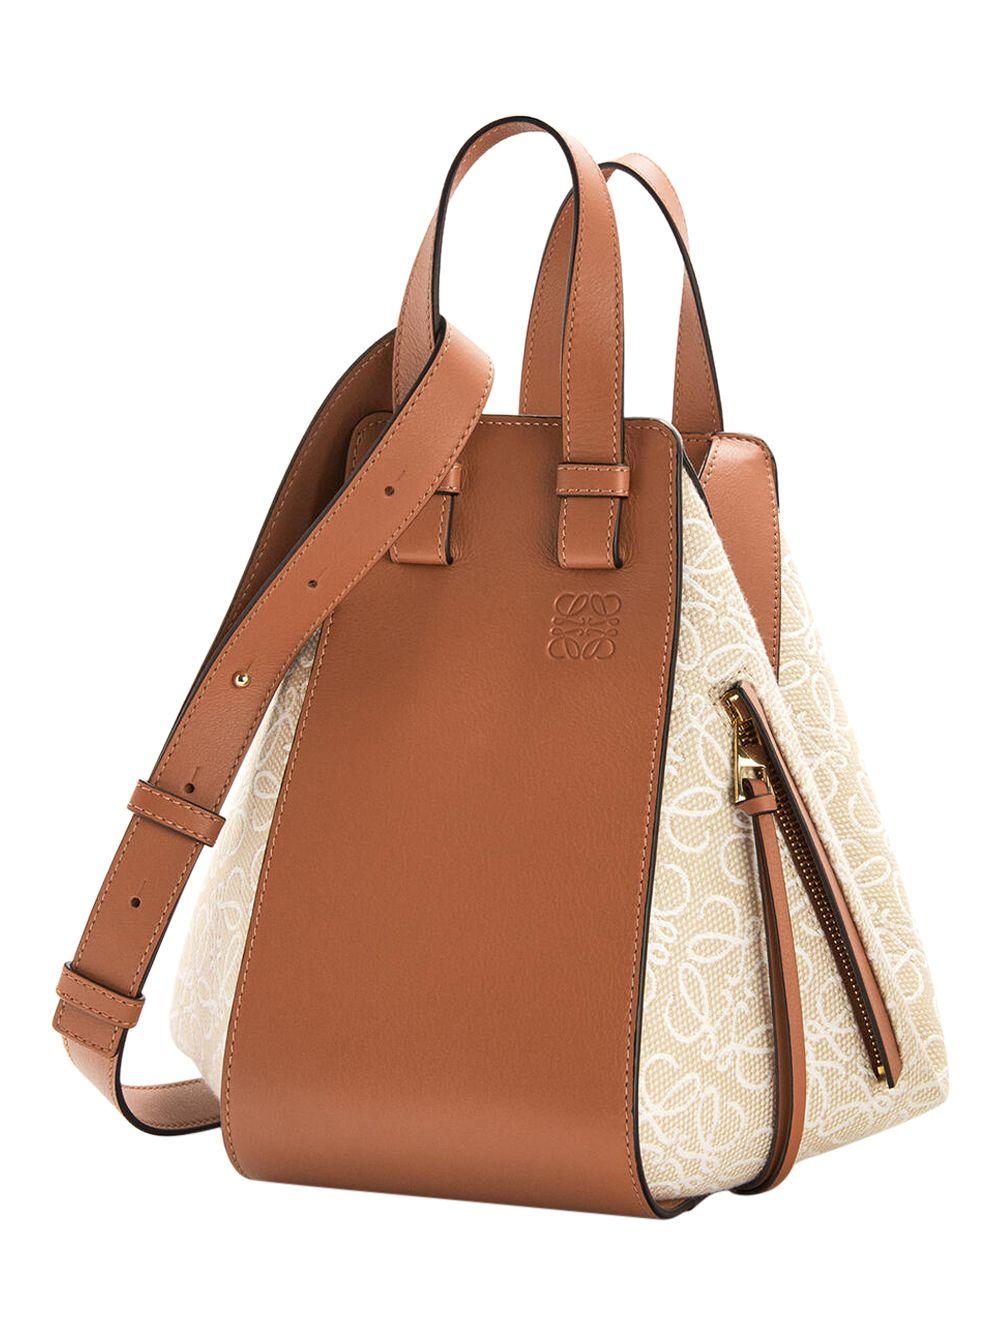 Hammock Anagram Small Bag,